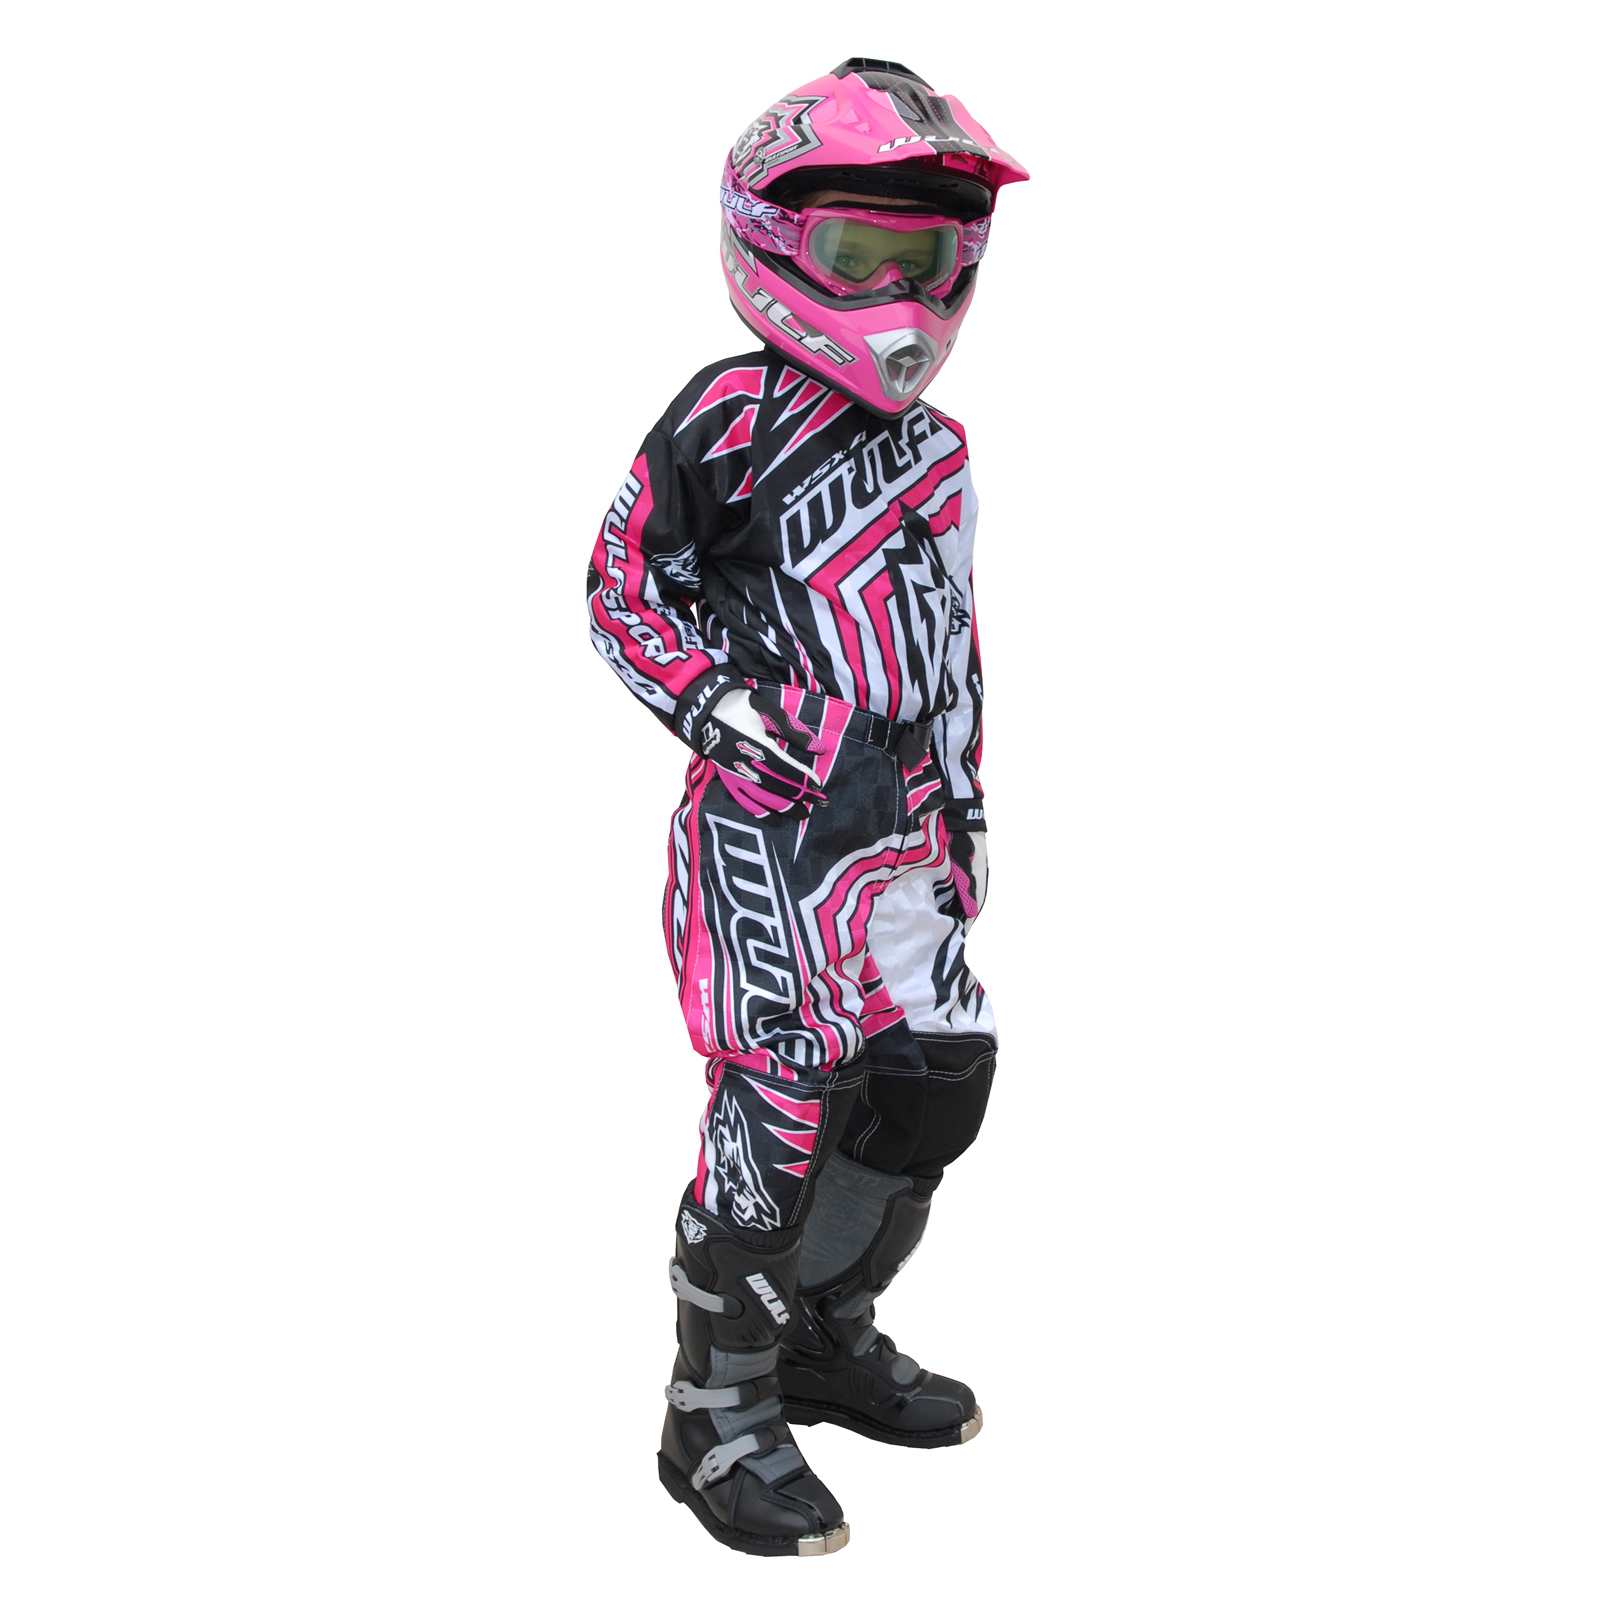 WULF WSX-4 GIRLS PINK KIDS OFF ROAD YOUTH MOTOCROSS JUNIOR MX JERSEY U0026 PANTS KIT | EBay